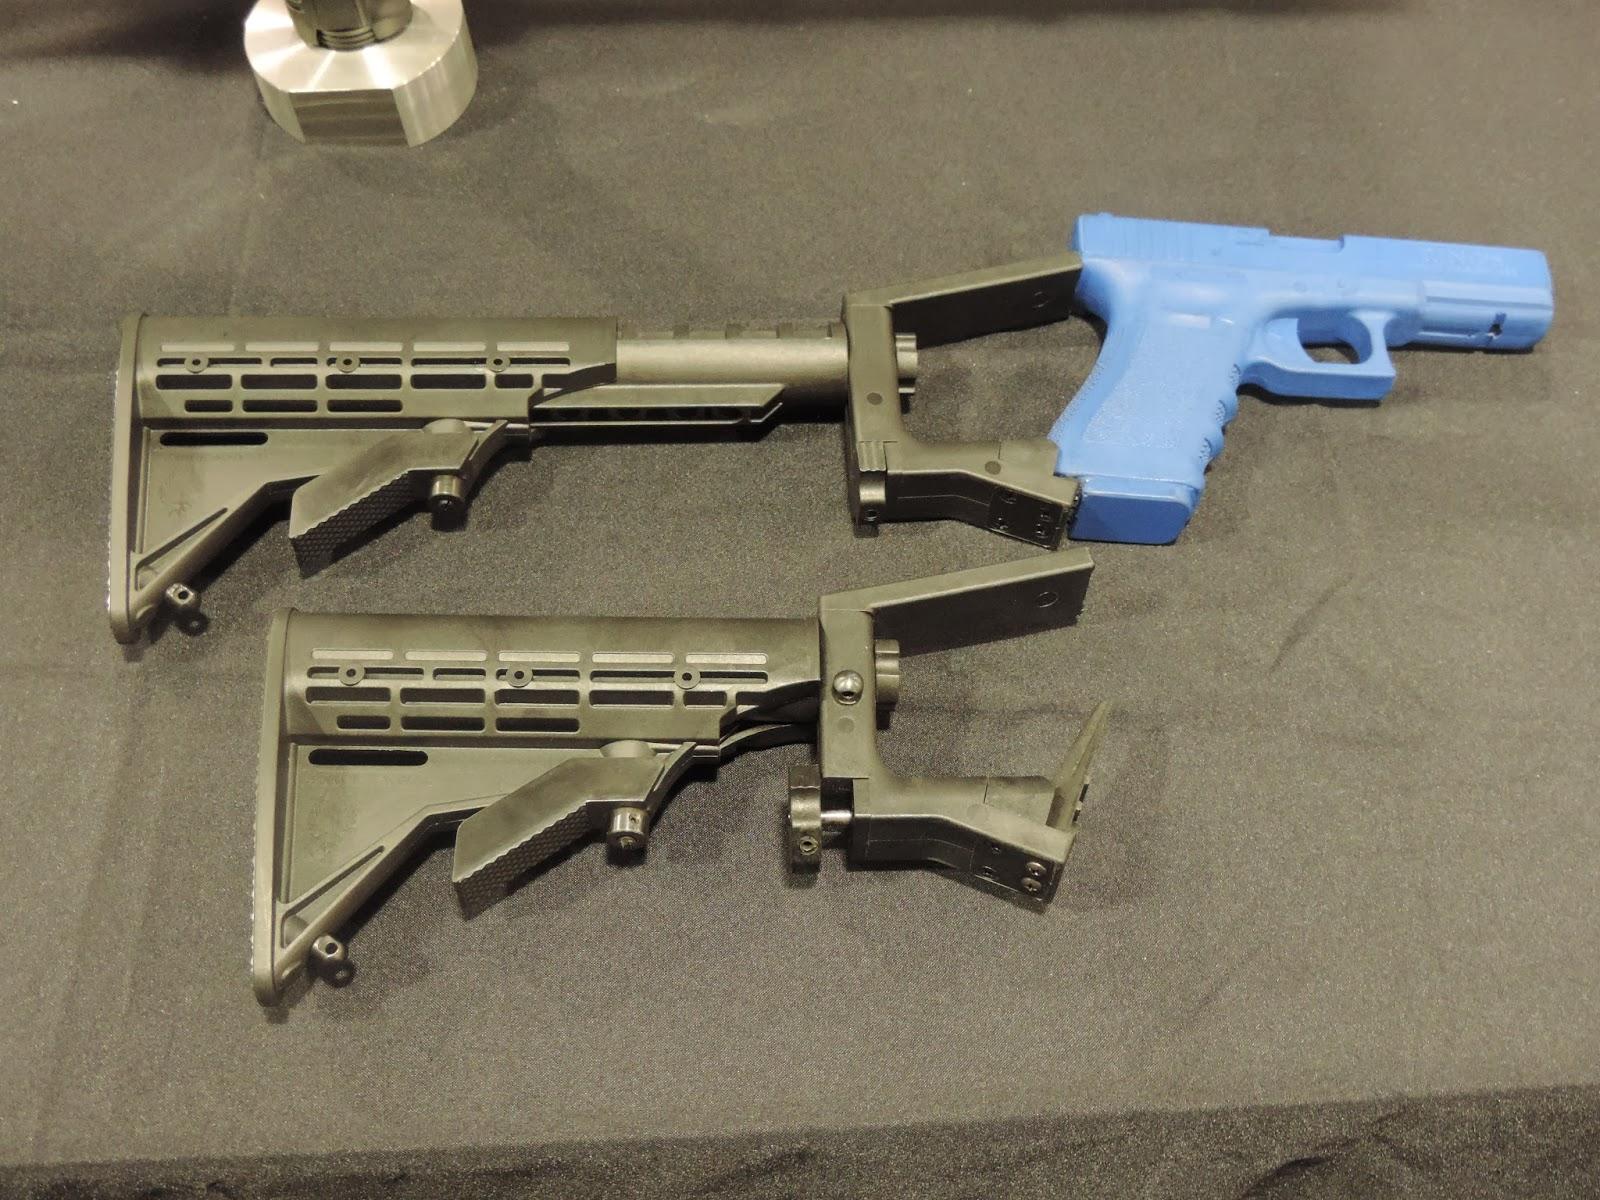 Phoenix Technology Glock M4 Stock Conversion KitNew Military Technology 2014